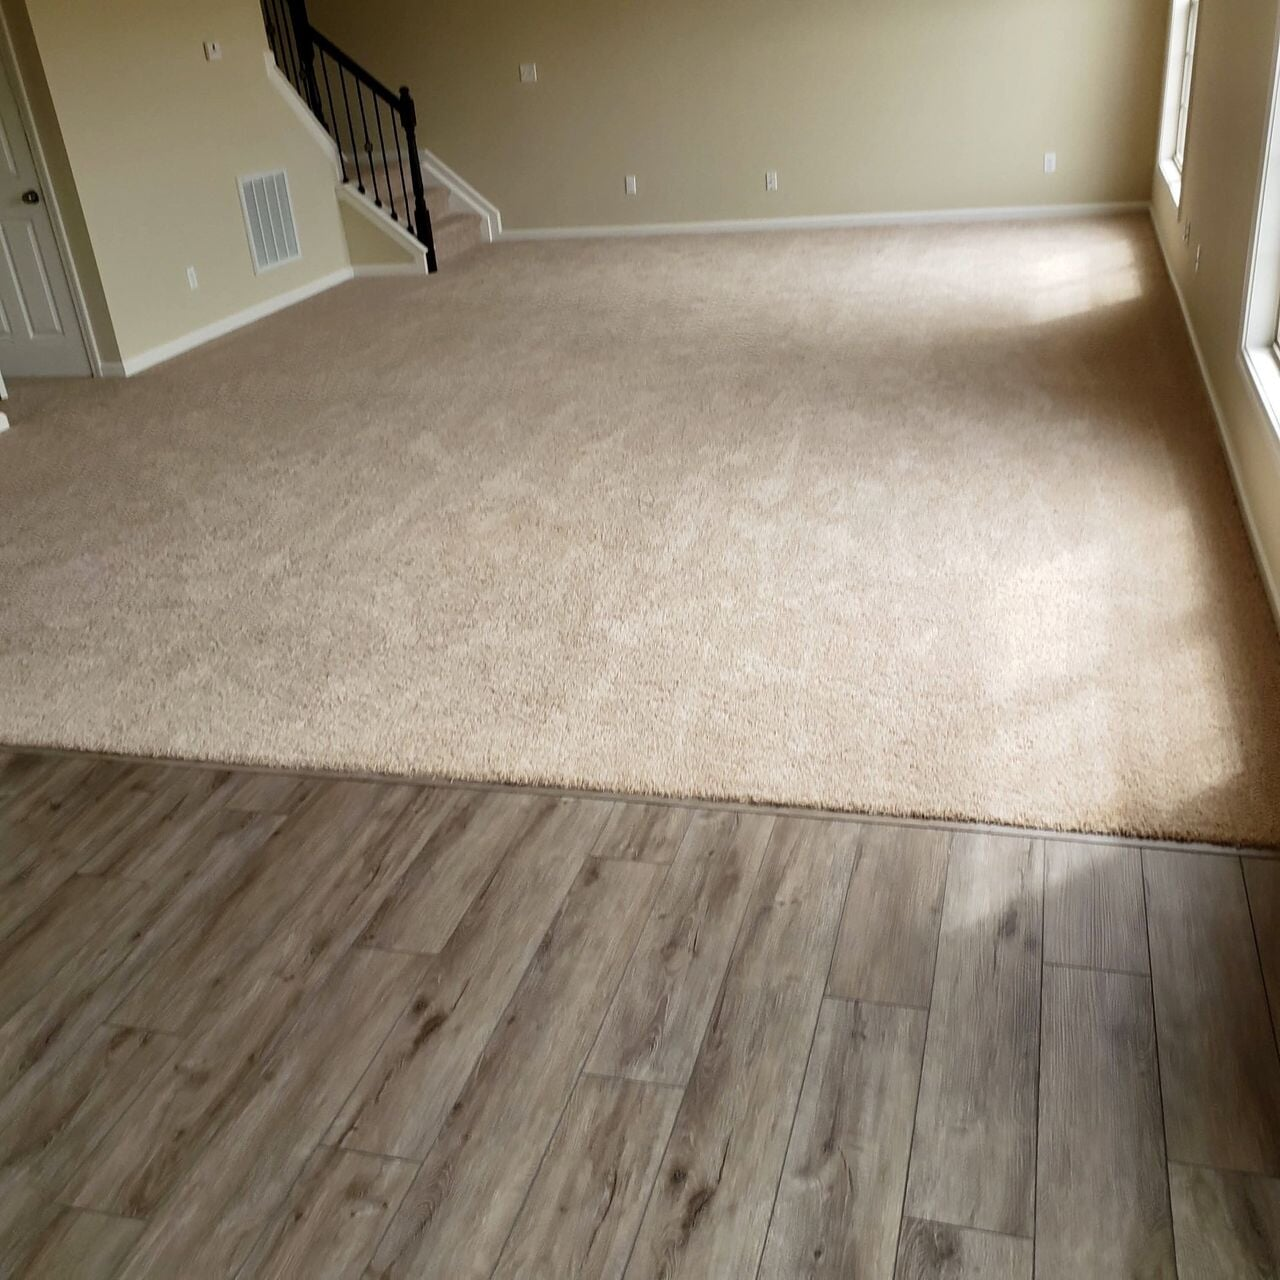 Carpet in Georgetown, KY from Karrianna Flooring